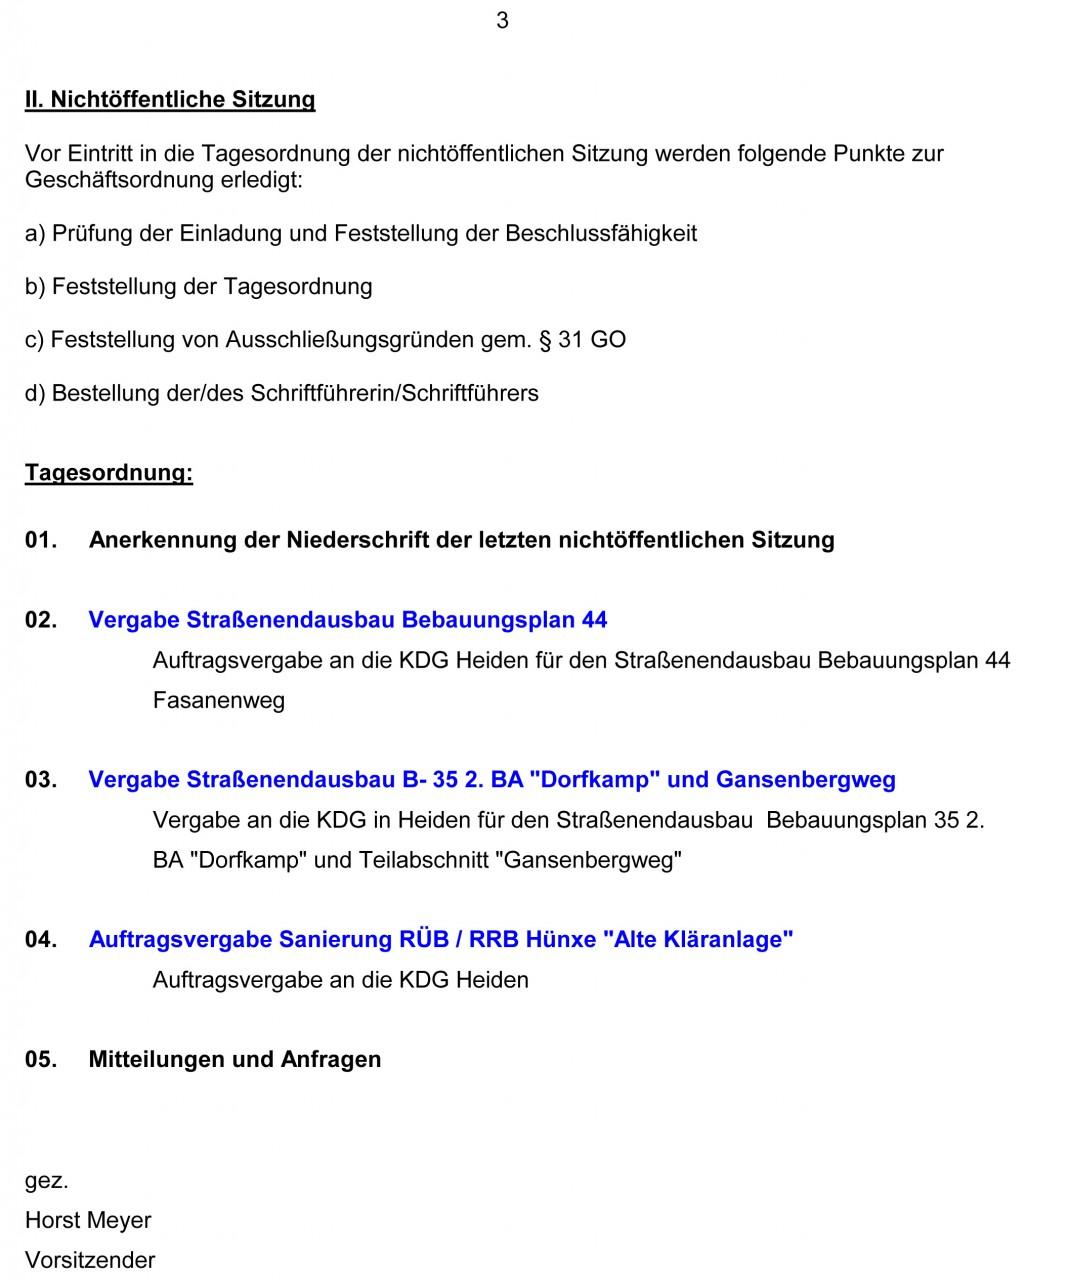 Tagesordnung Bauausschuss 7. Sitzung2016.docx